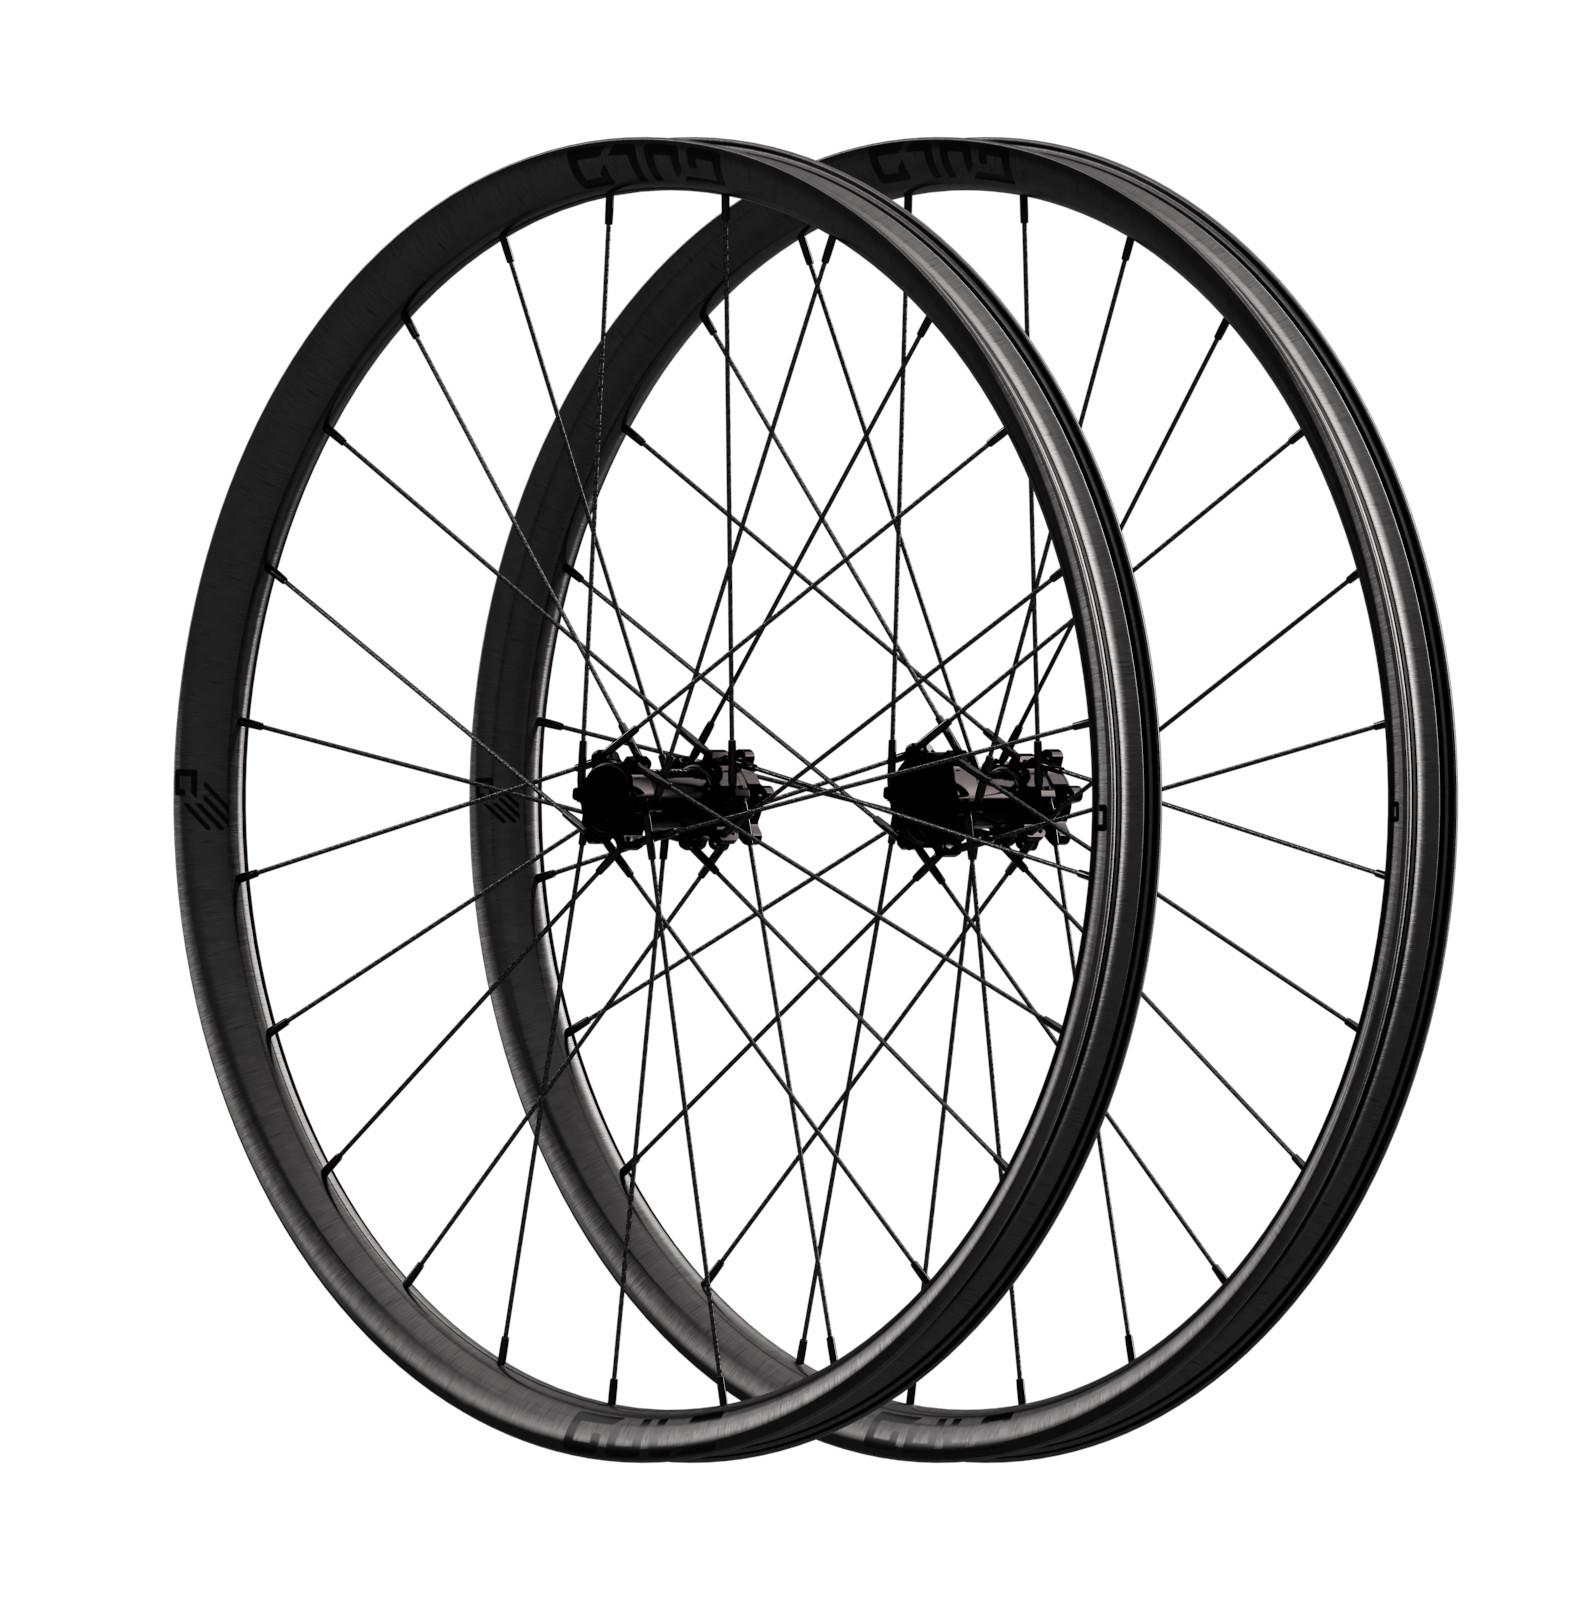 Gulo Composites GME-30 Enduro Wheel System